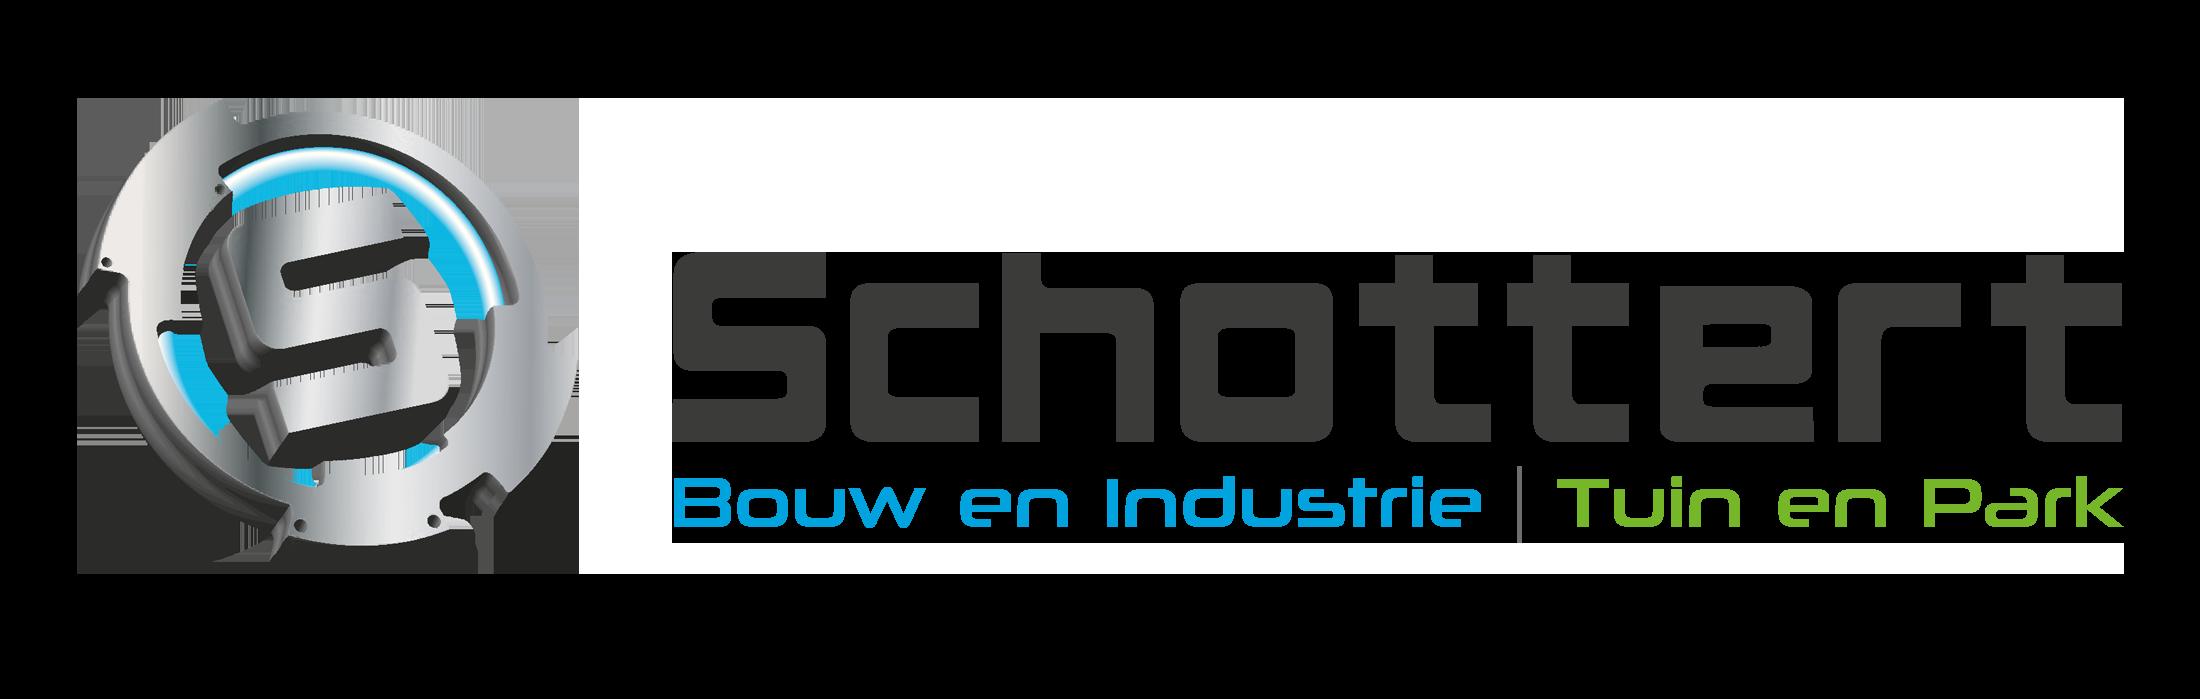 Schottert B.V.